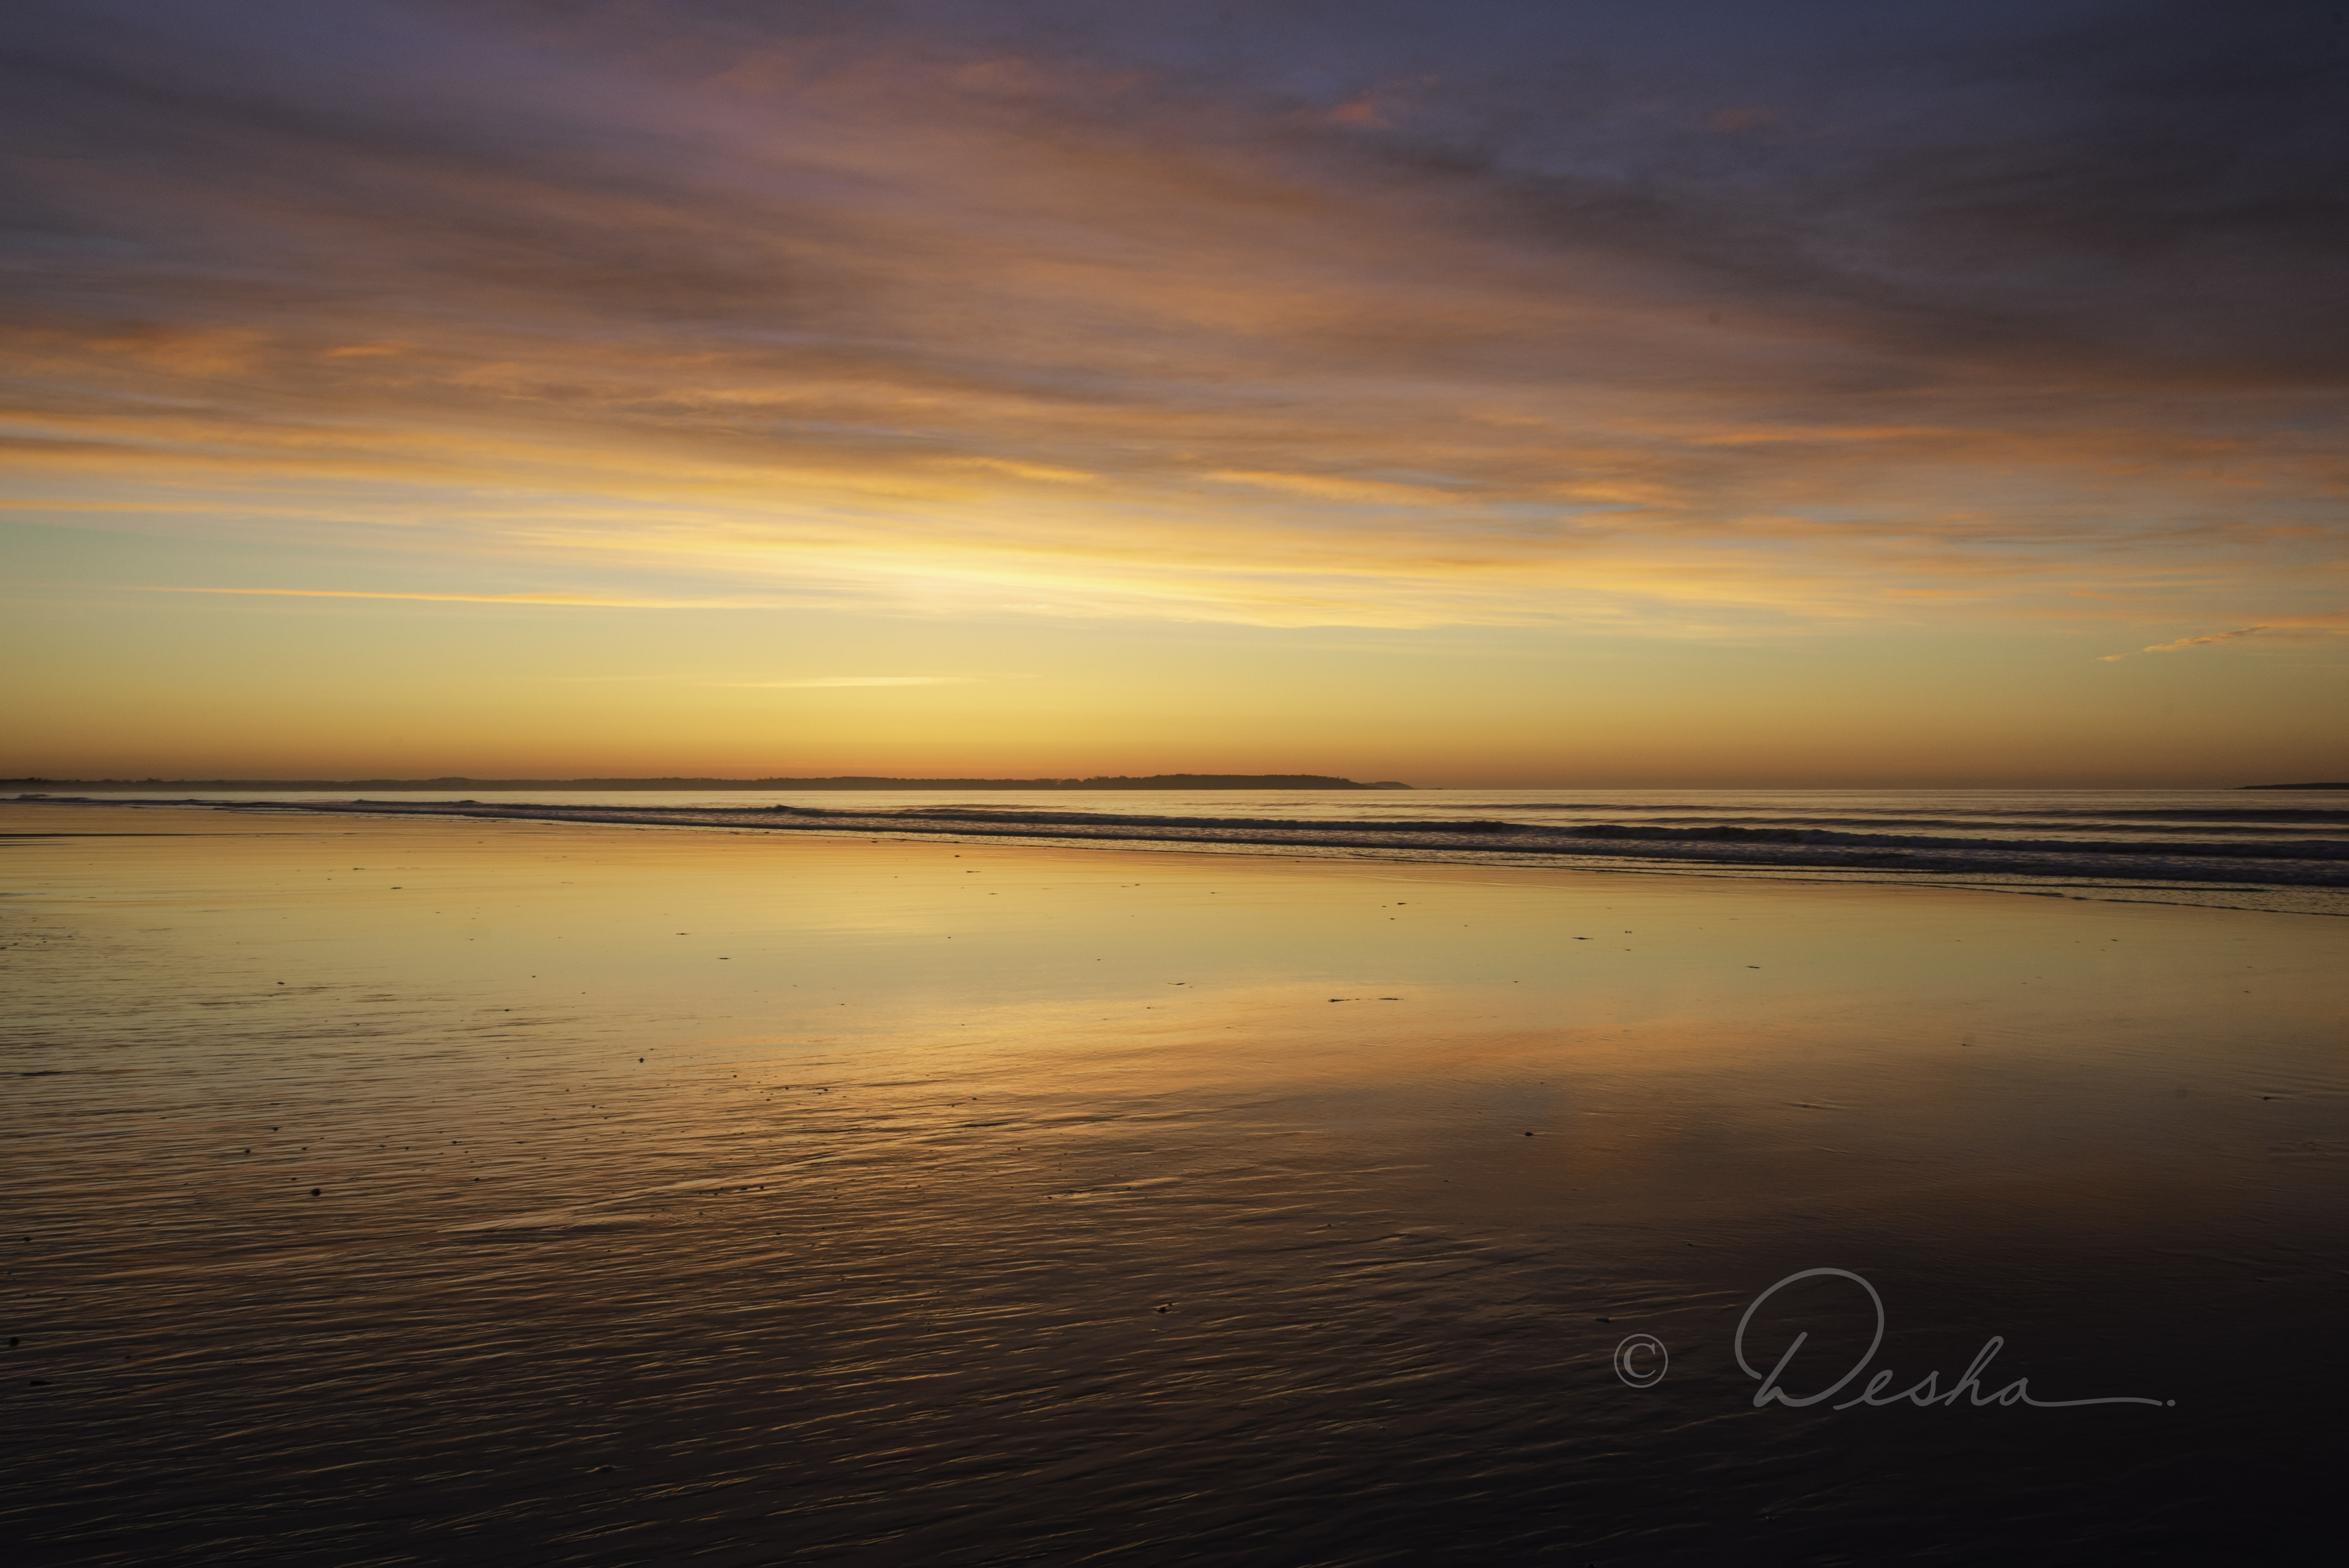 Sunrise, Old Orchard Beach, Maine